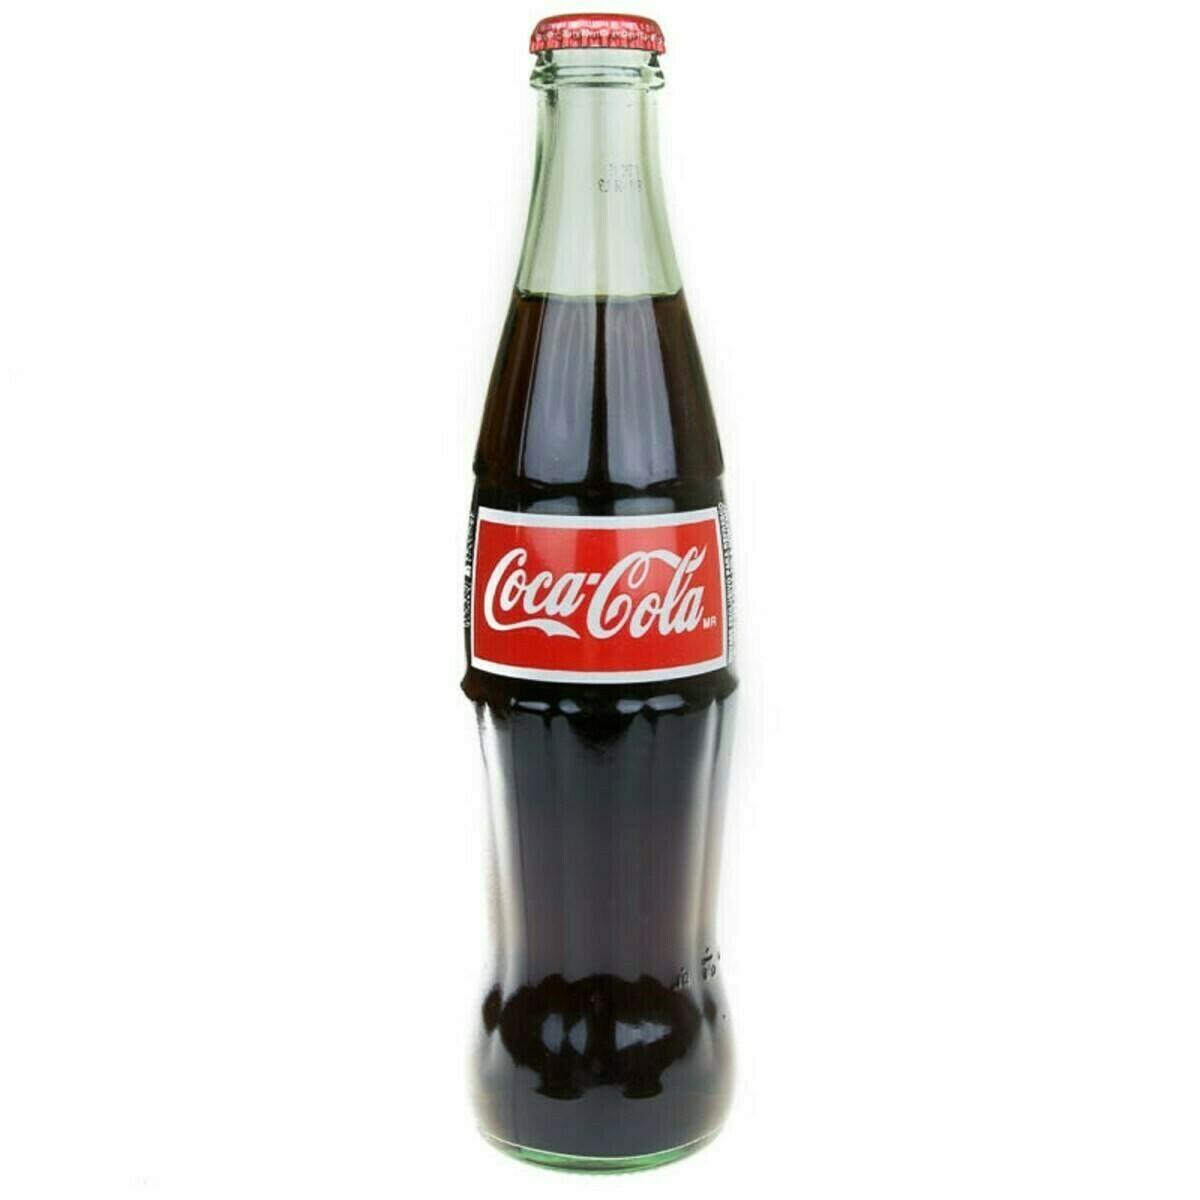 Coca-cola mexicana 500ml